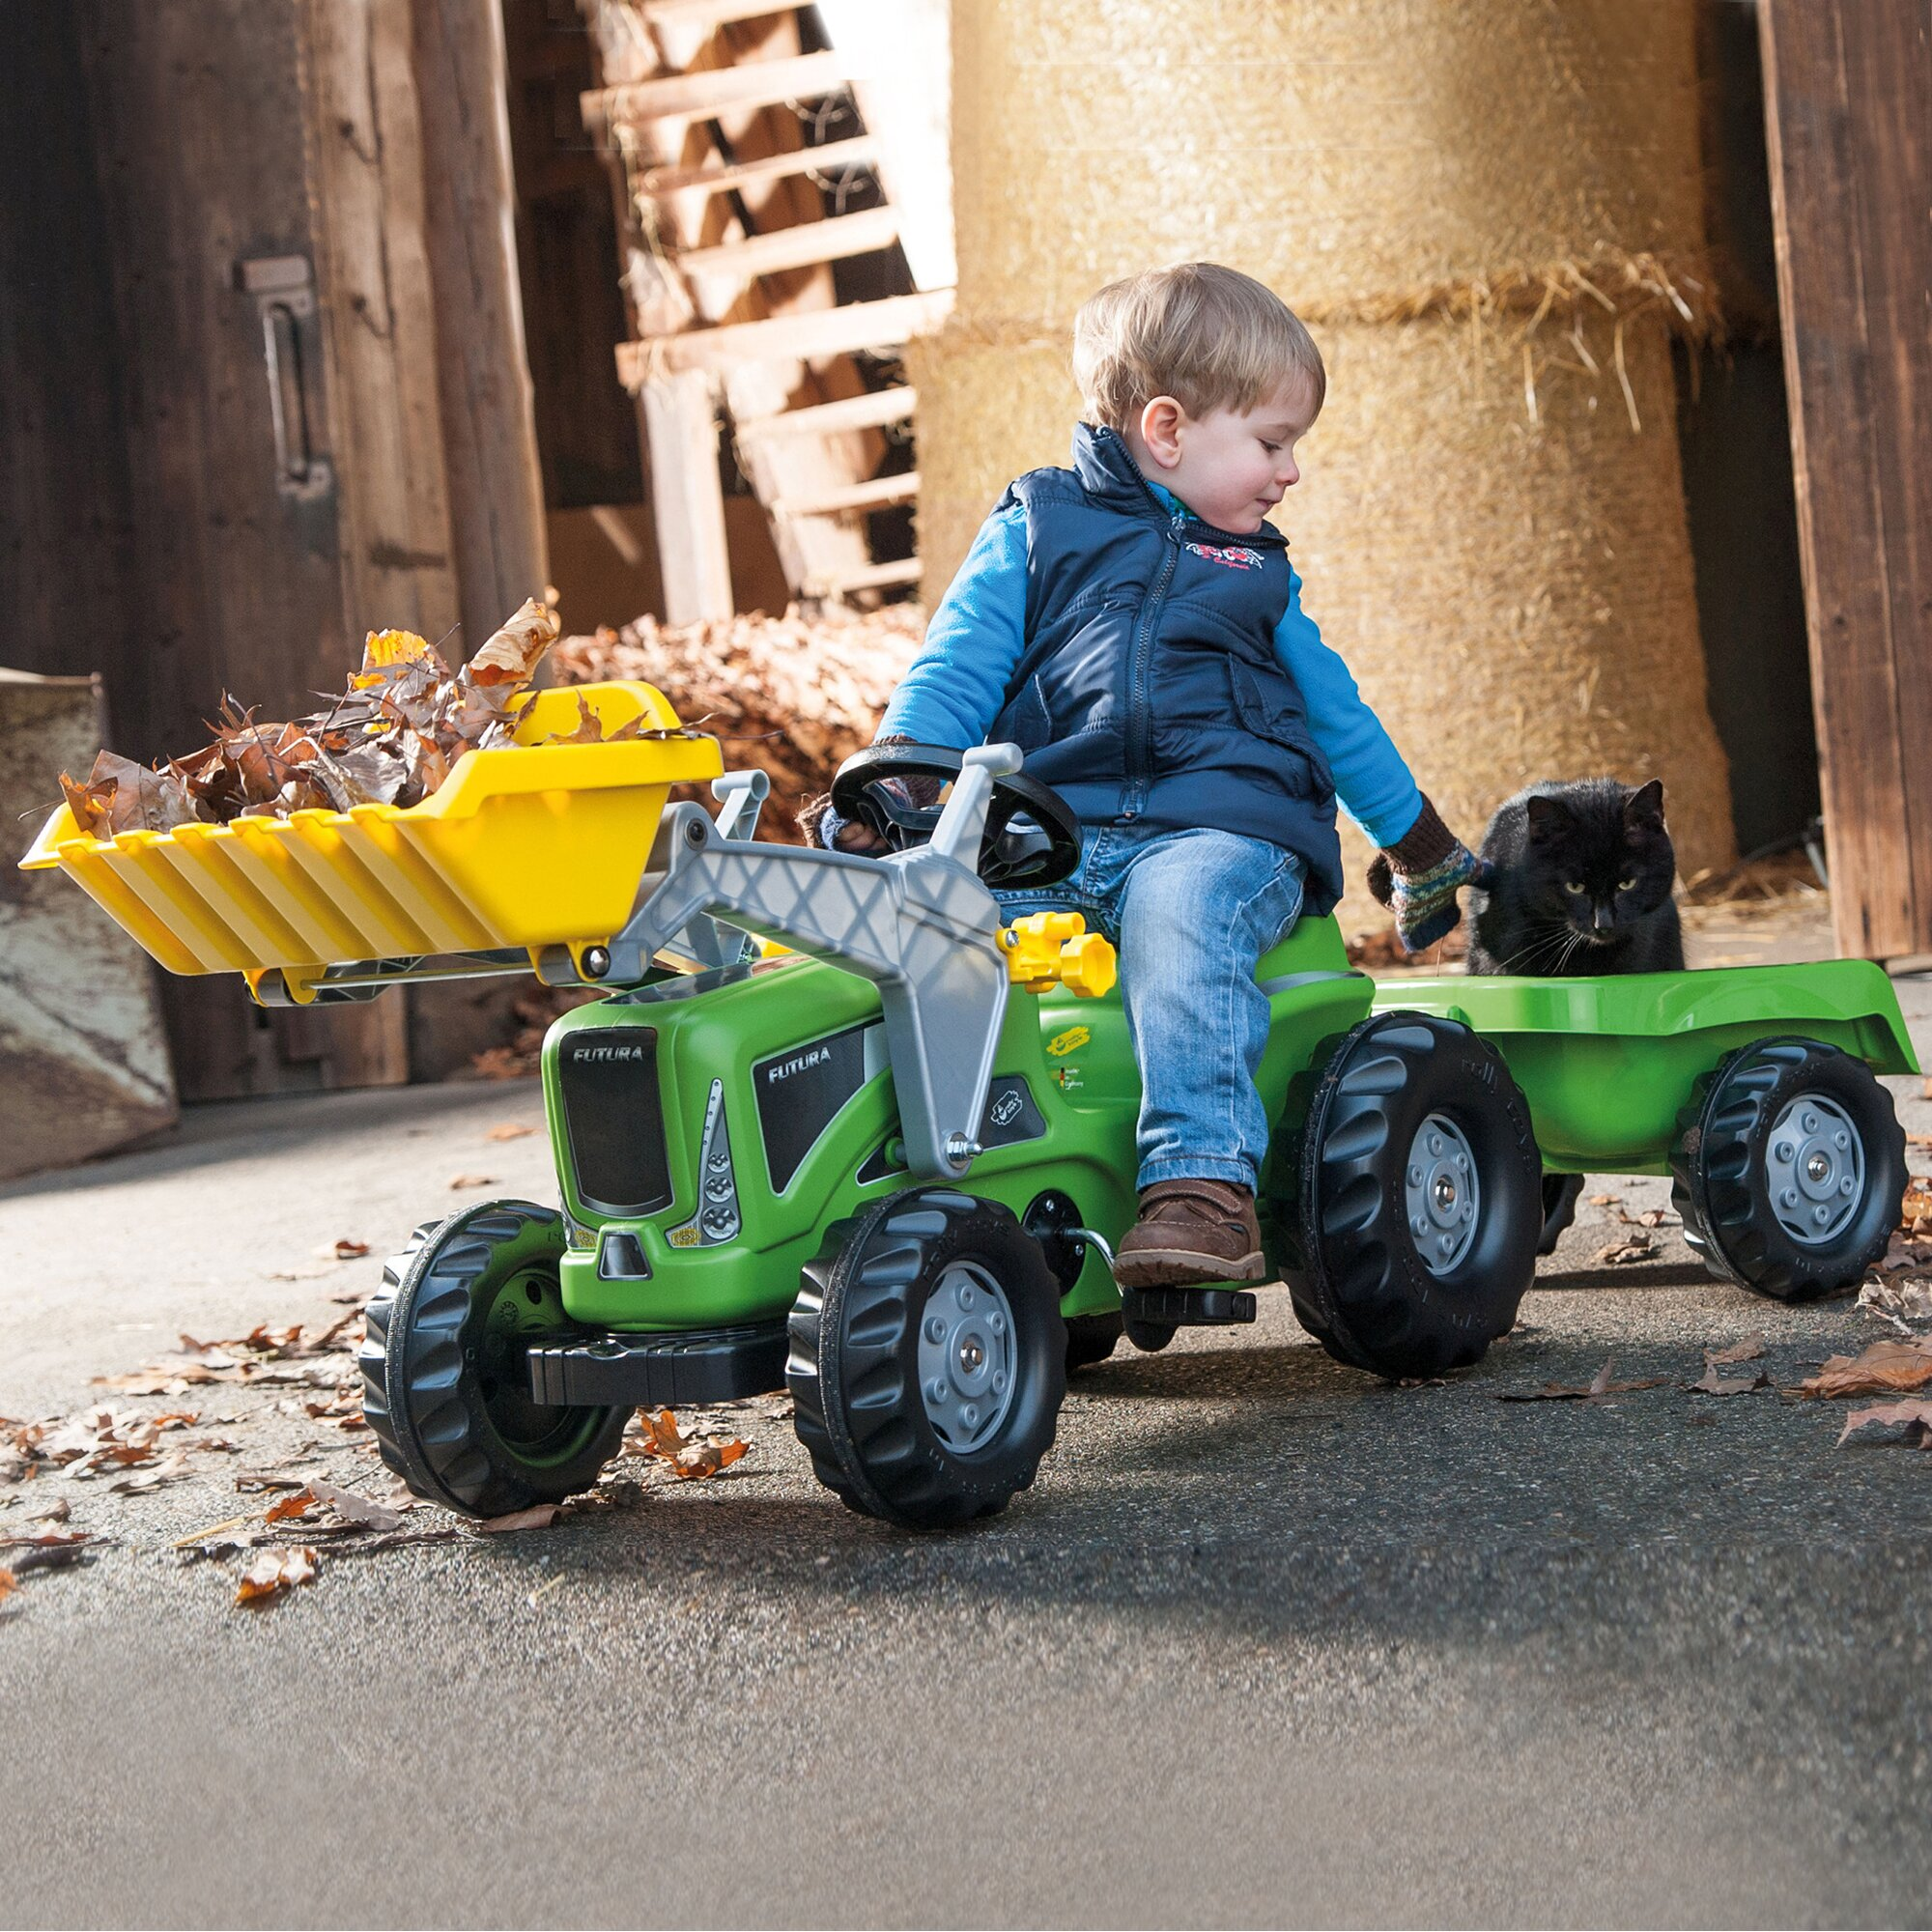 rolly-toys-trettraktor-rolly-kiddy-futura-mit-frontlader-und-anhanger